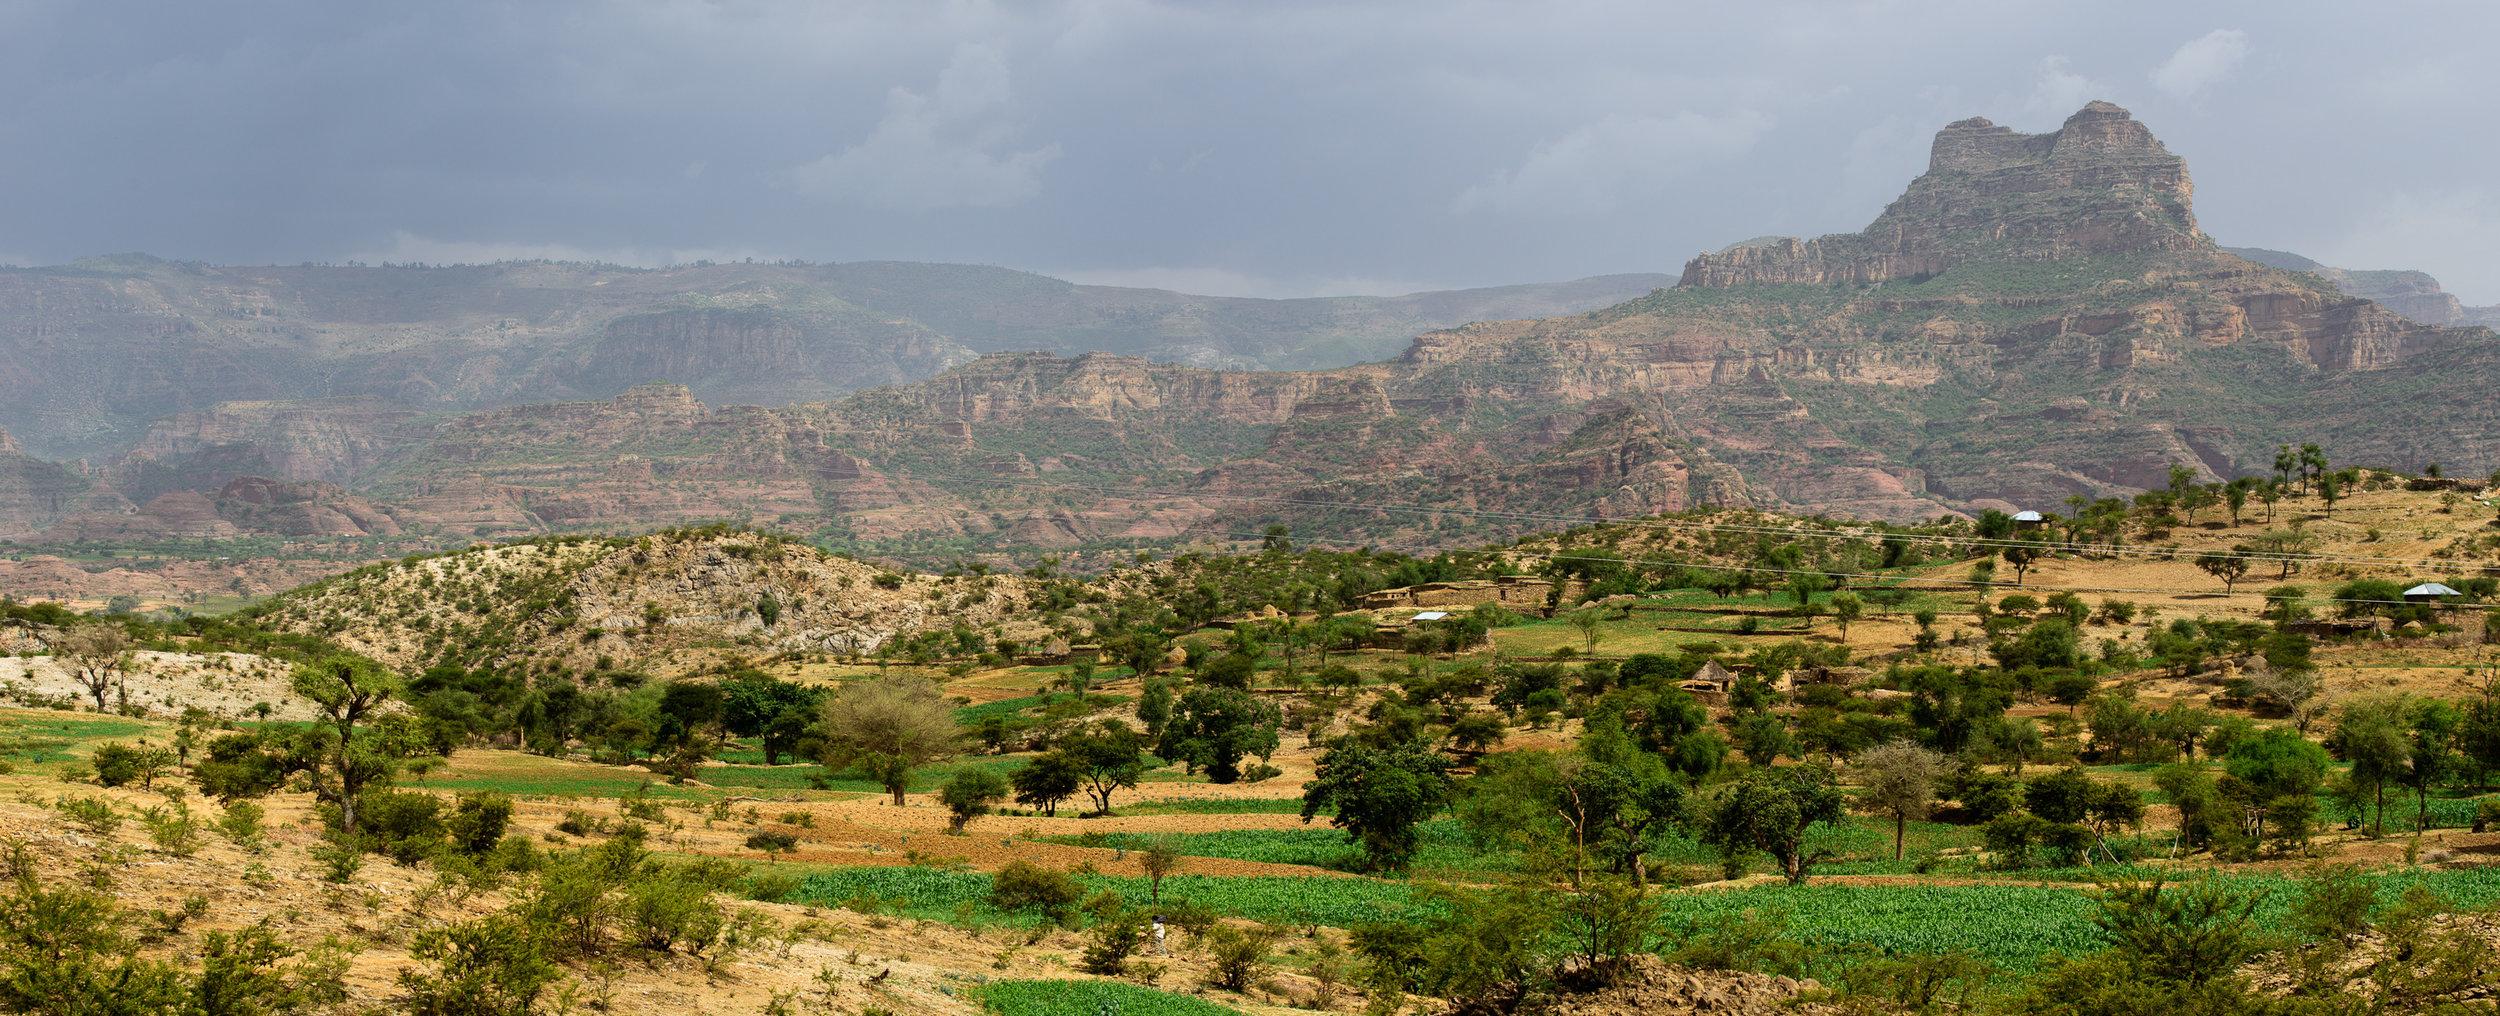 Ethiopano.jpg